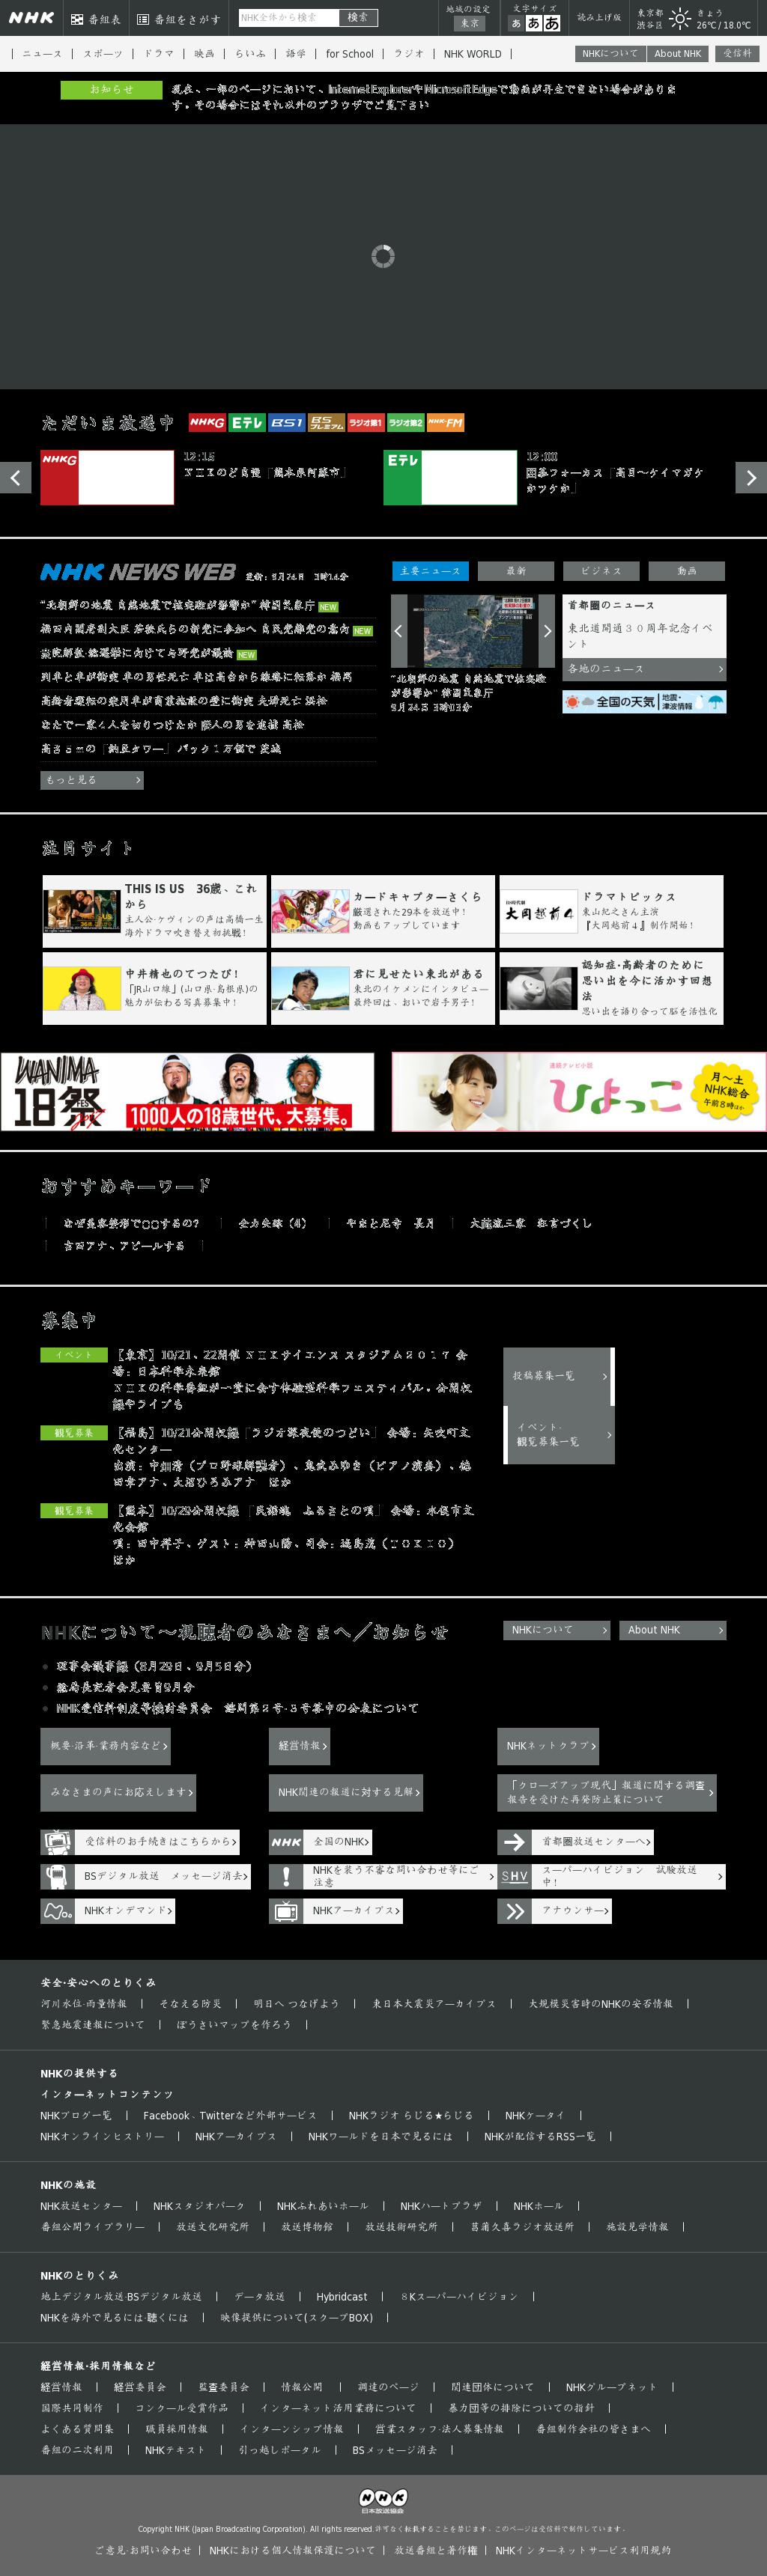 NHK Online at Sunday Sept. 24, 2017, 3:20 a.m. UTC